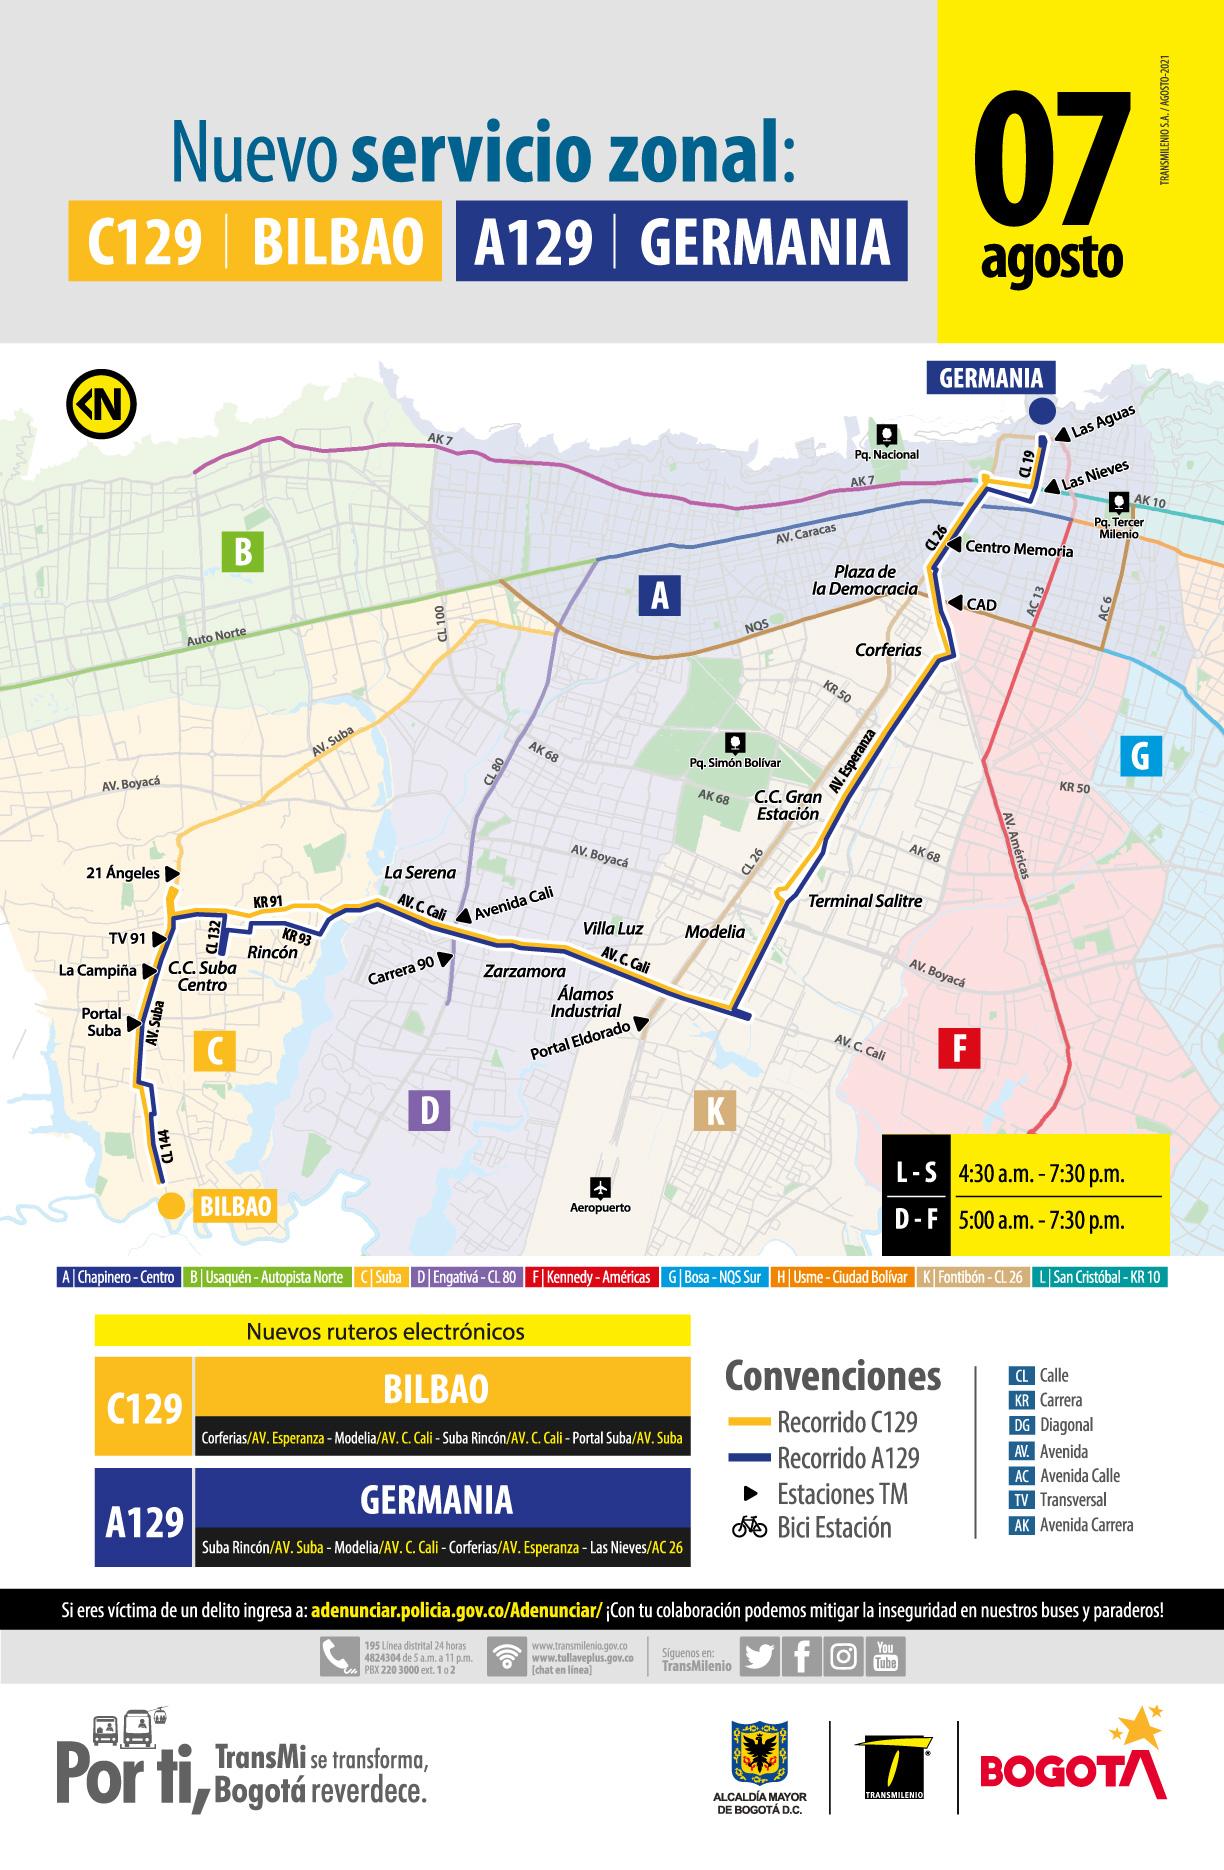 C129 Bilbao – A129 Germania